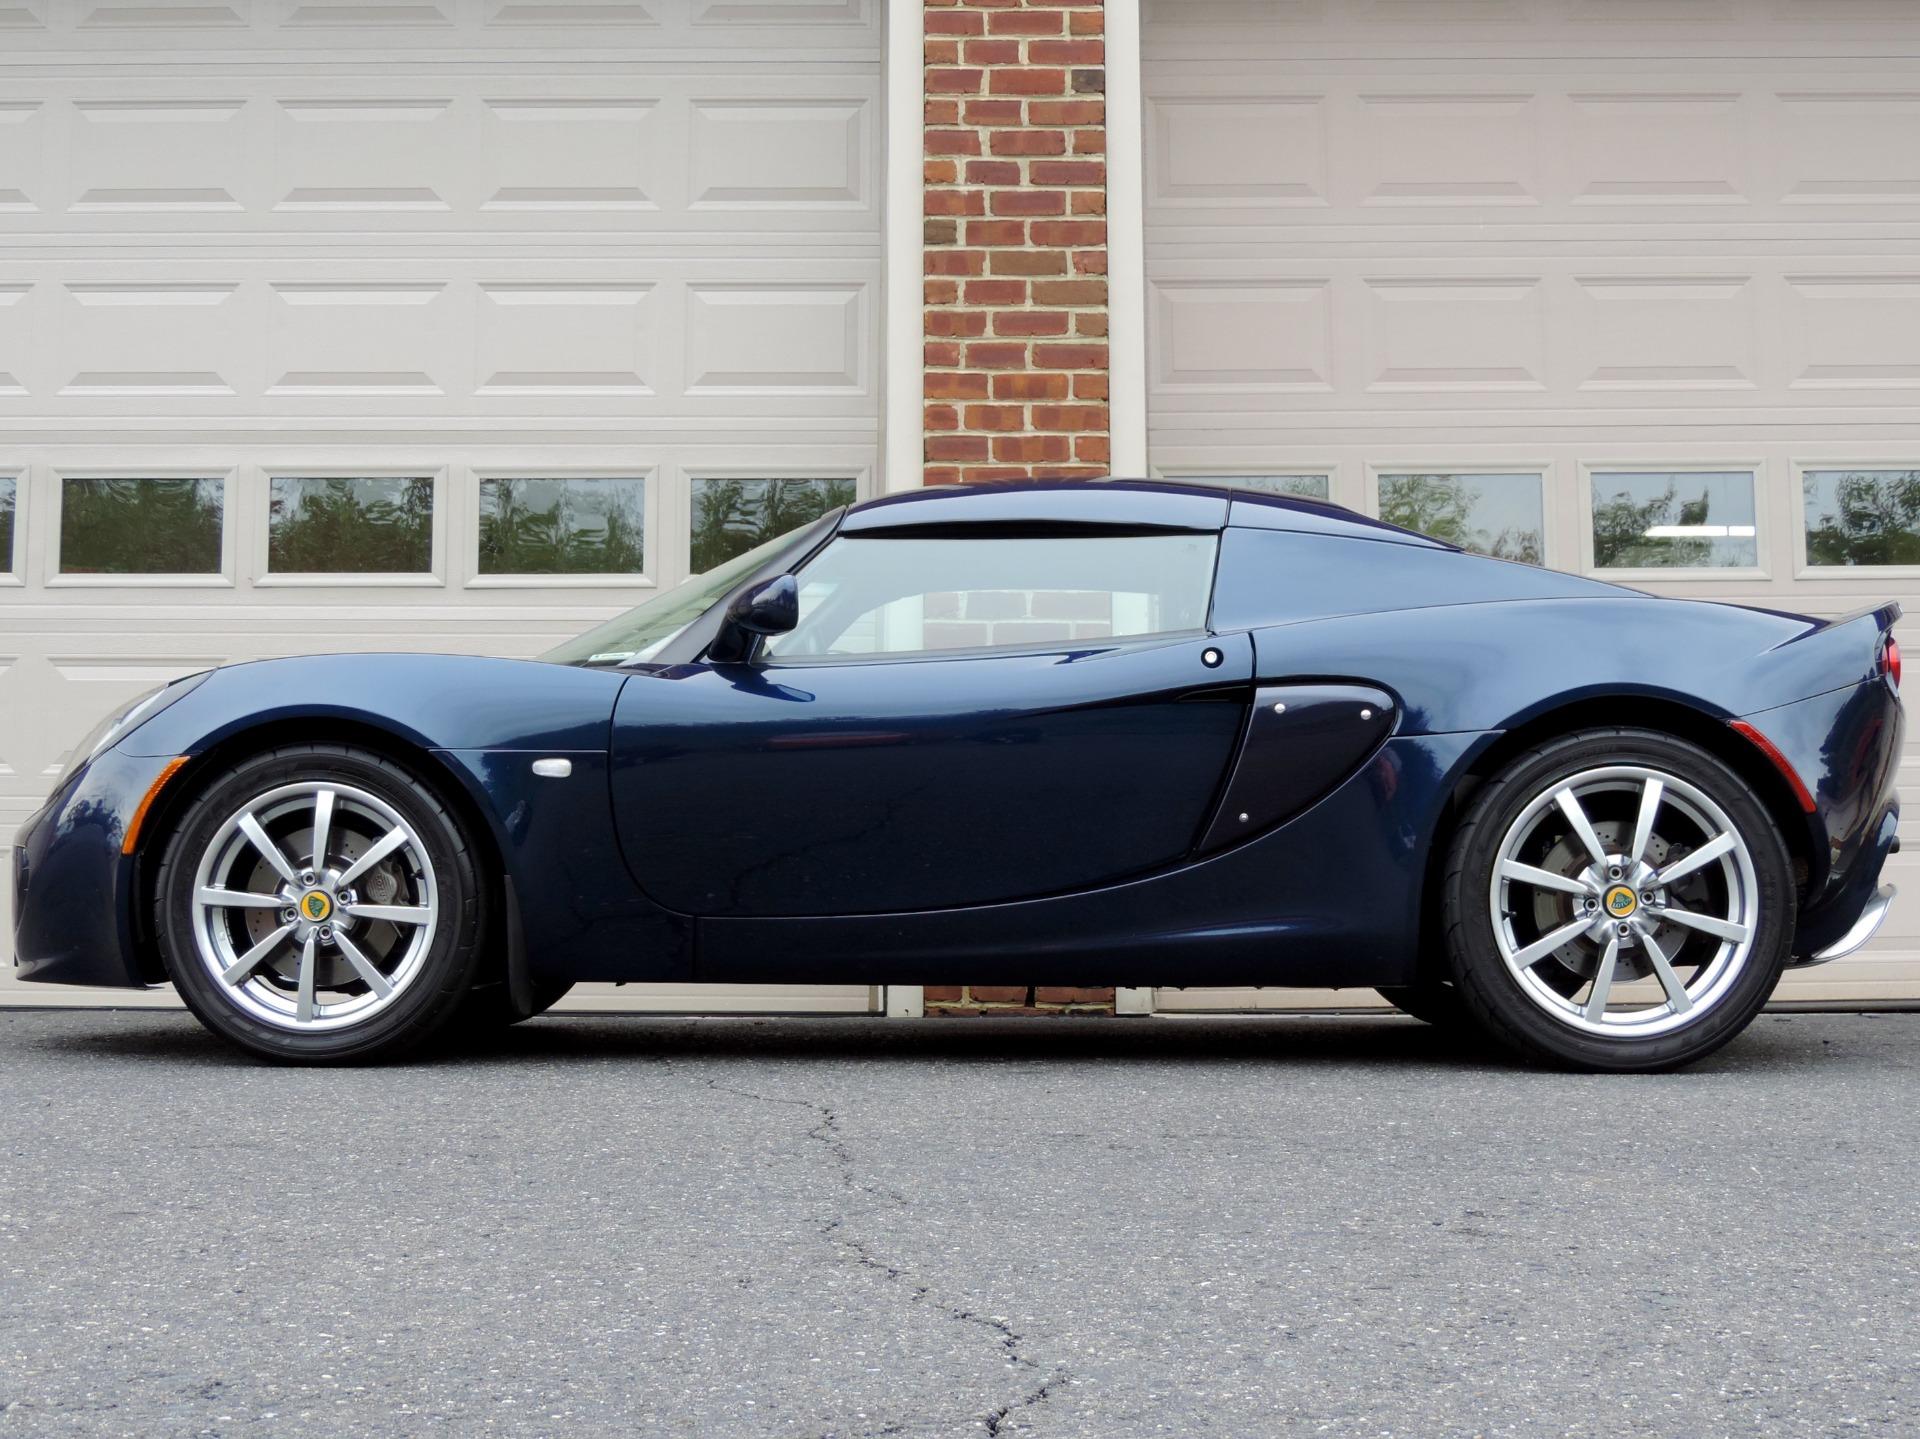 Used-2005-Lotus-Elise-Convertible